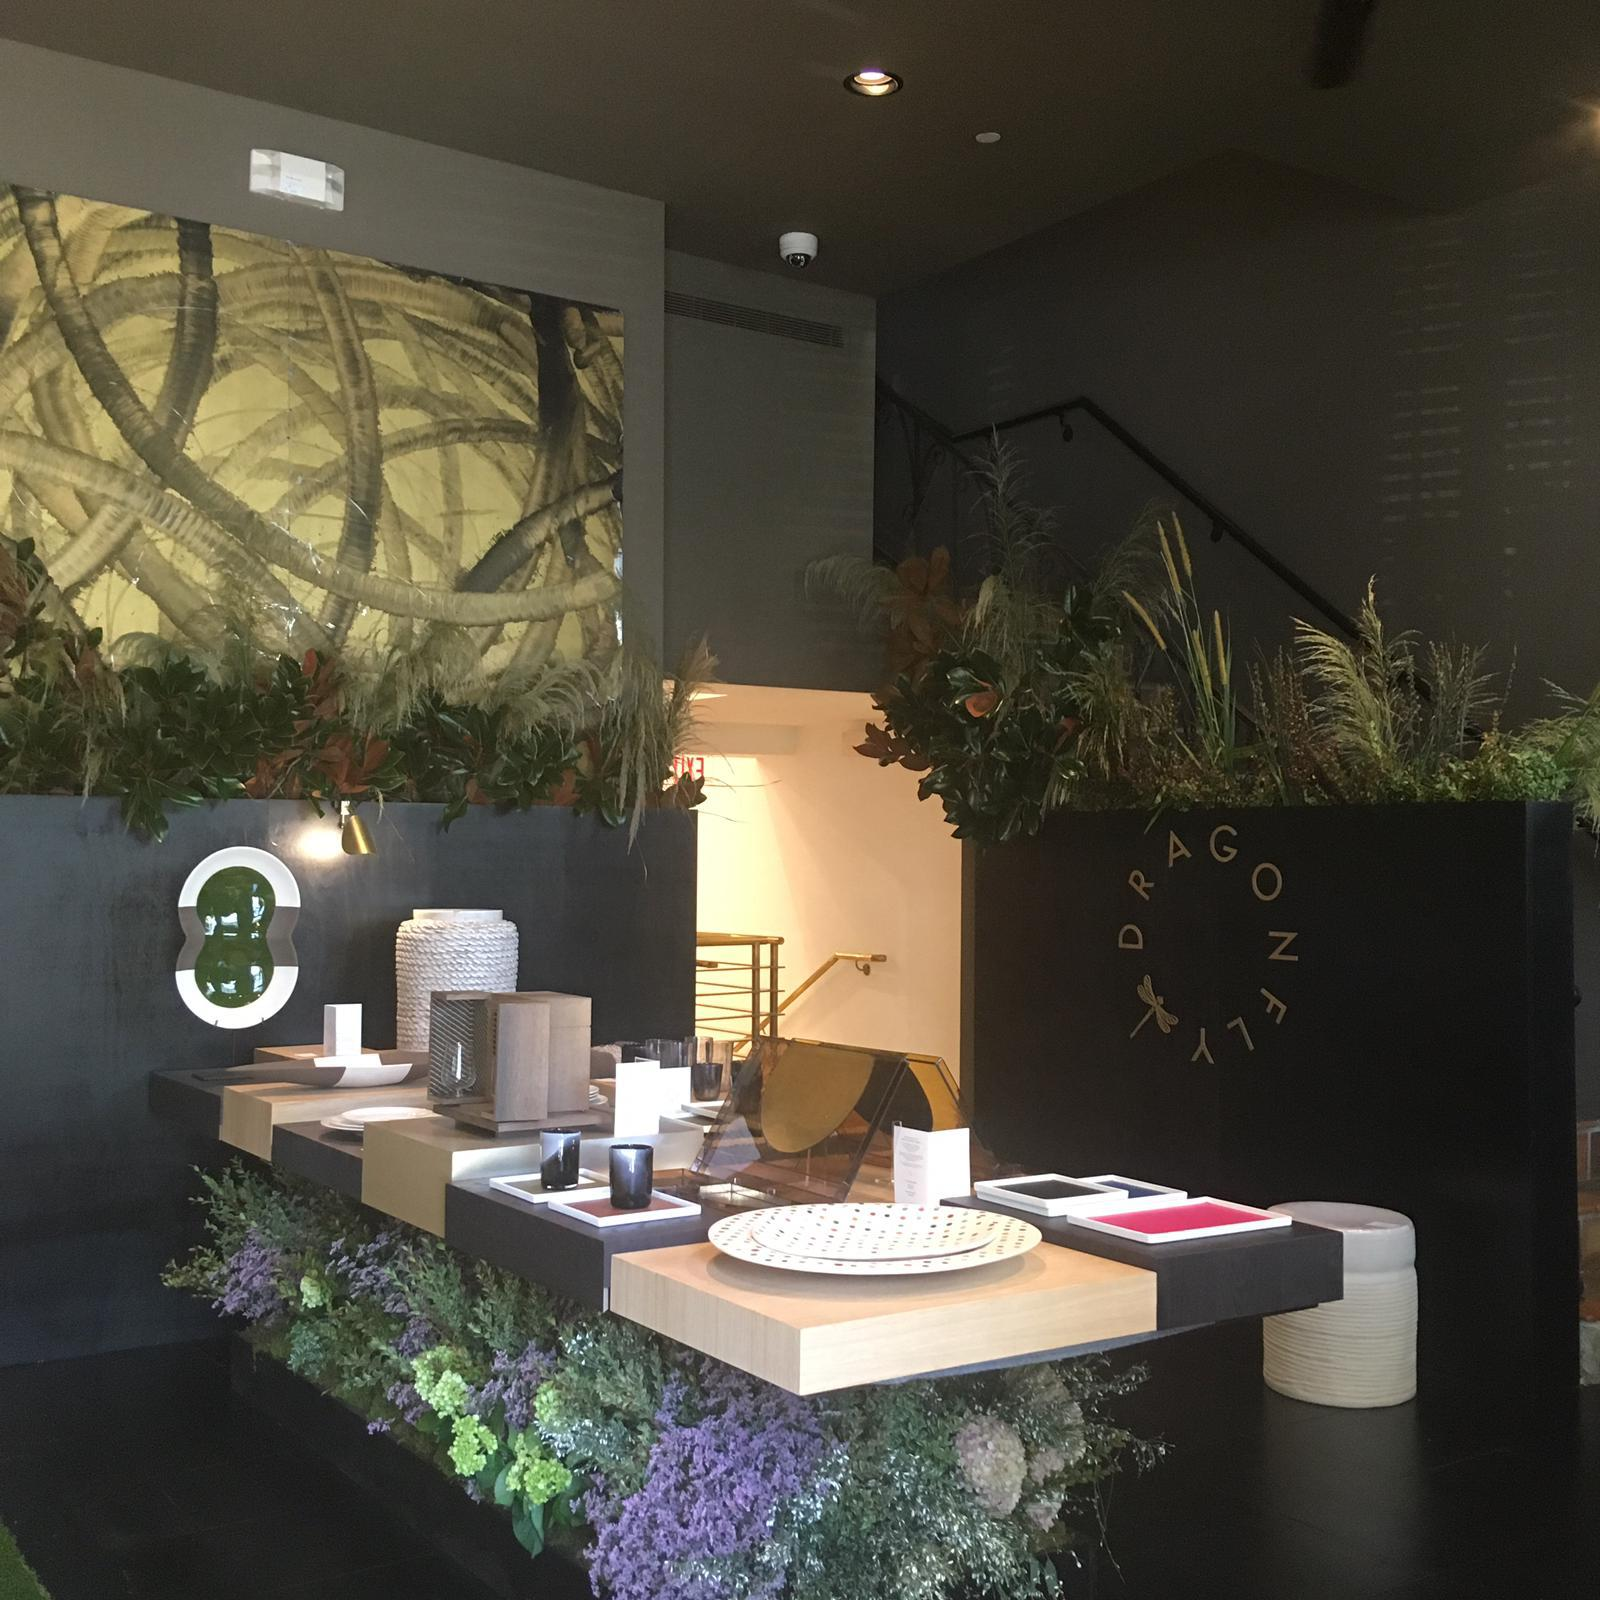 Design week - Miami